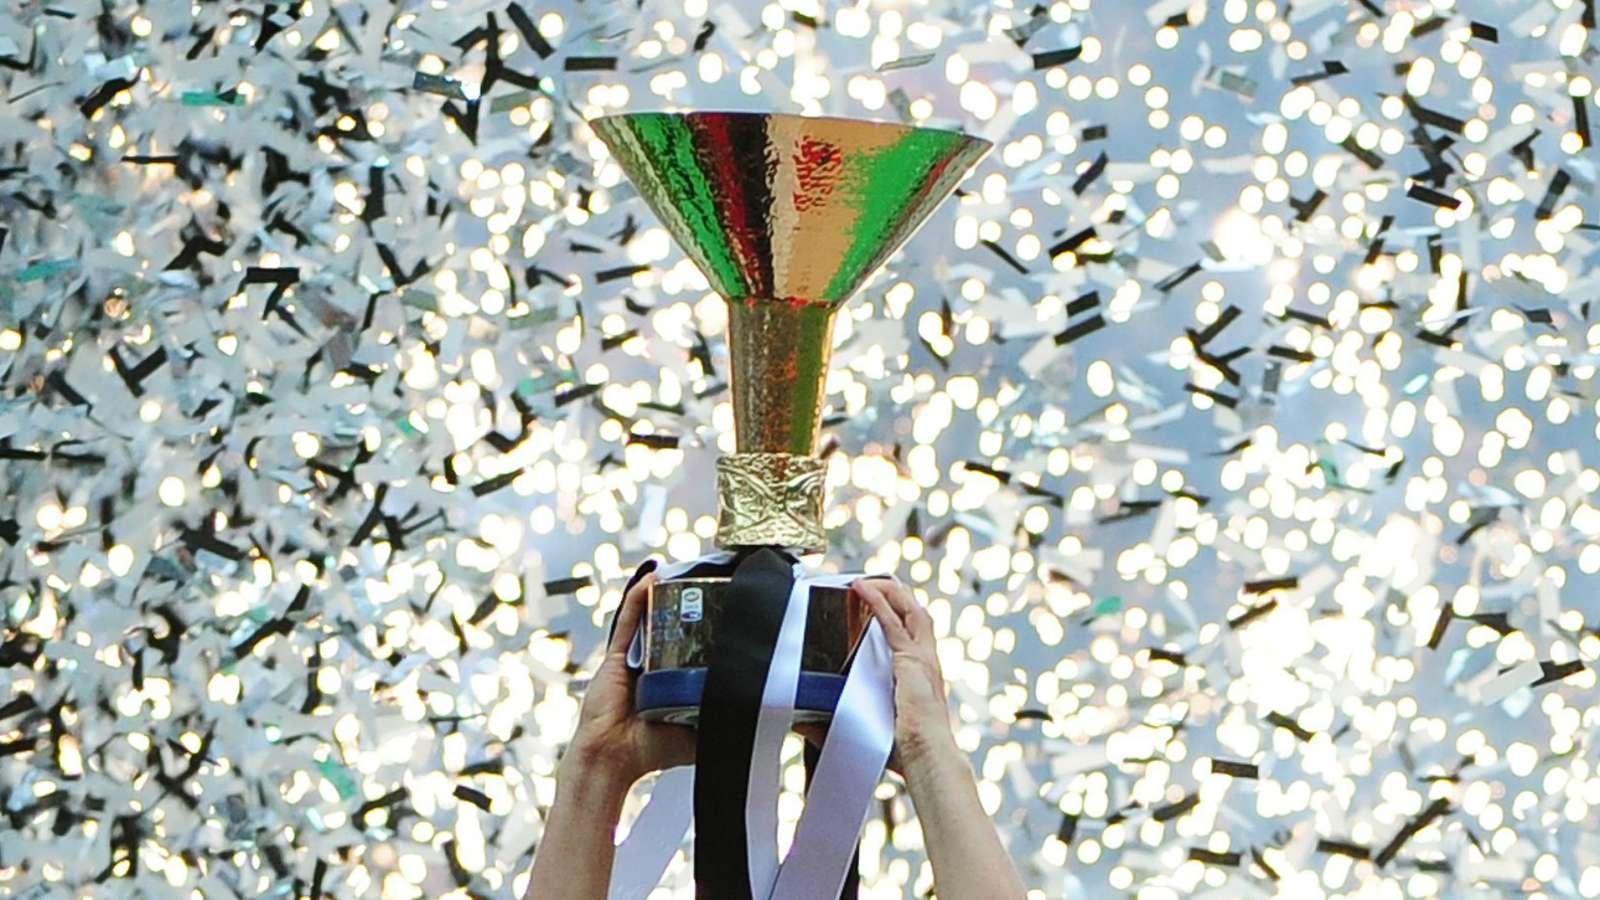 https: img.okeinfo.net content 2020 04 09 47 2196889 lippi-inginkan-juara-liga-italia-2019-2020-dapat-trofi-di-lapangan-kiNP2tk4pB.jpg